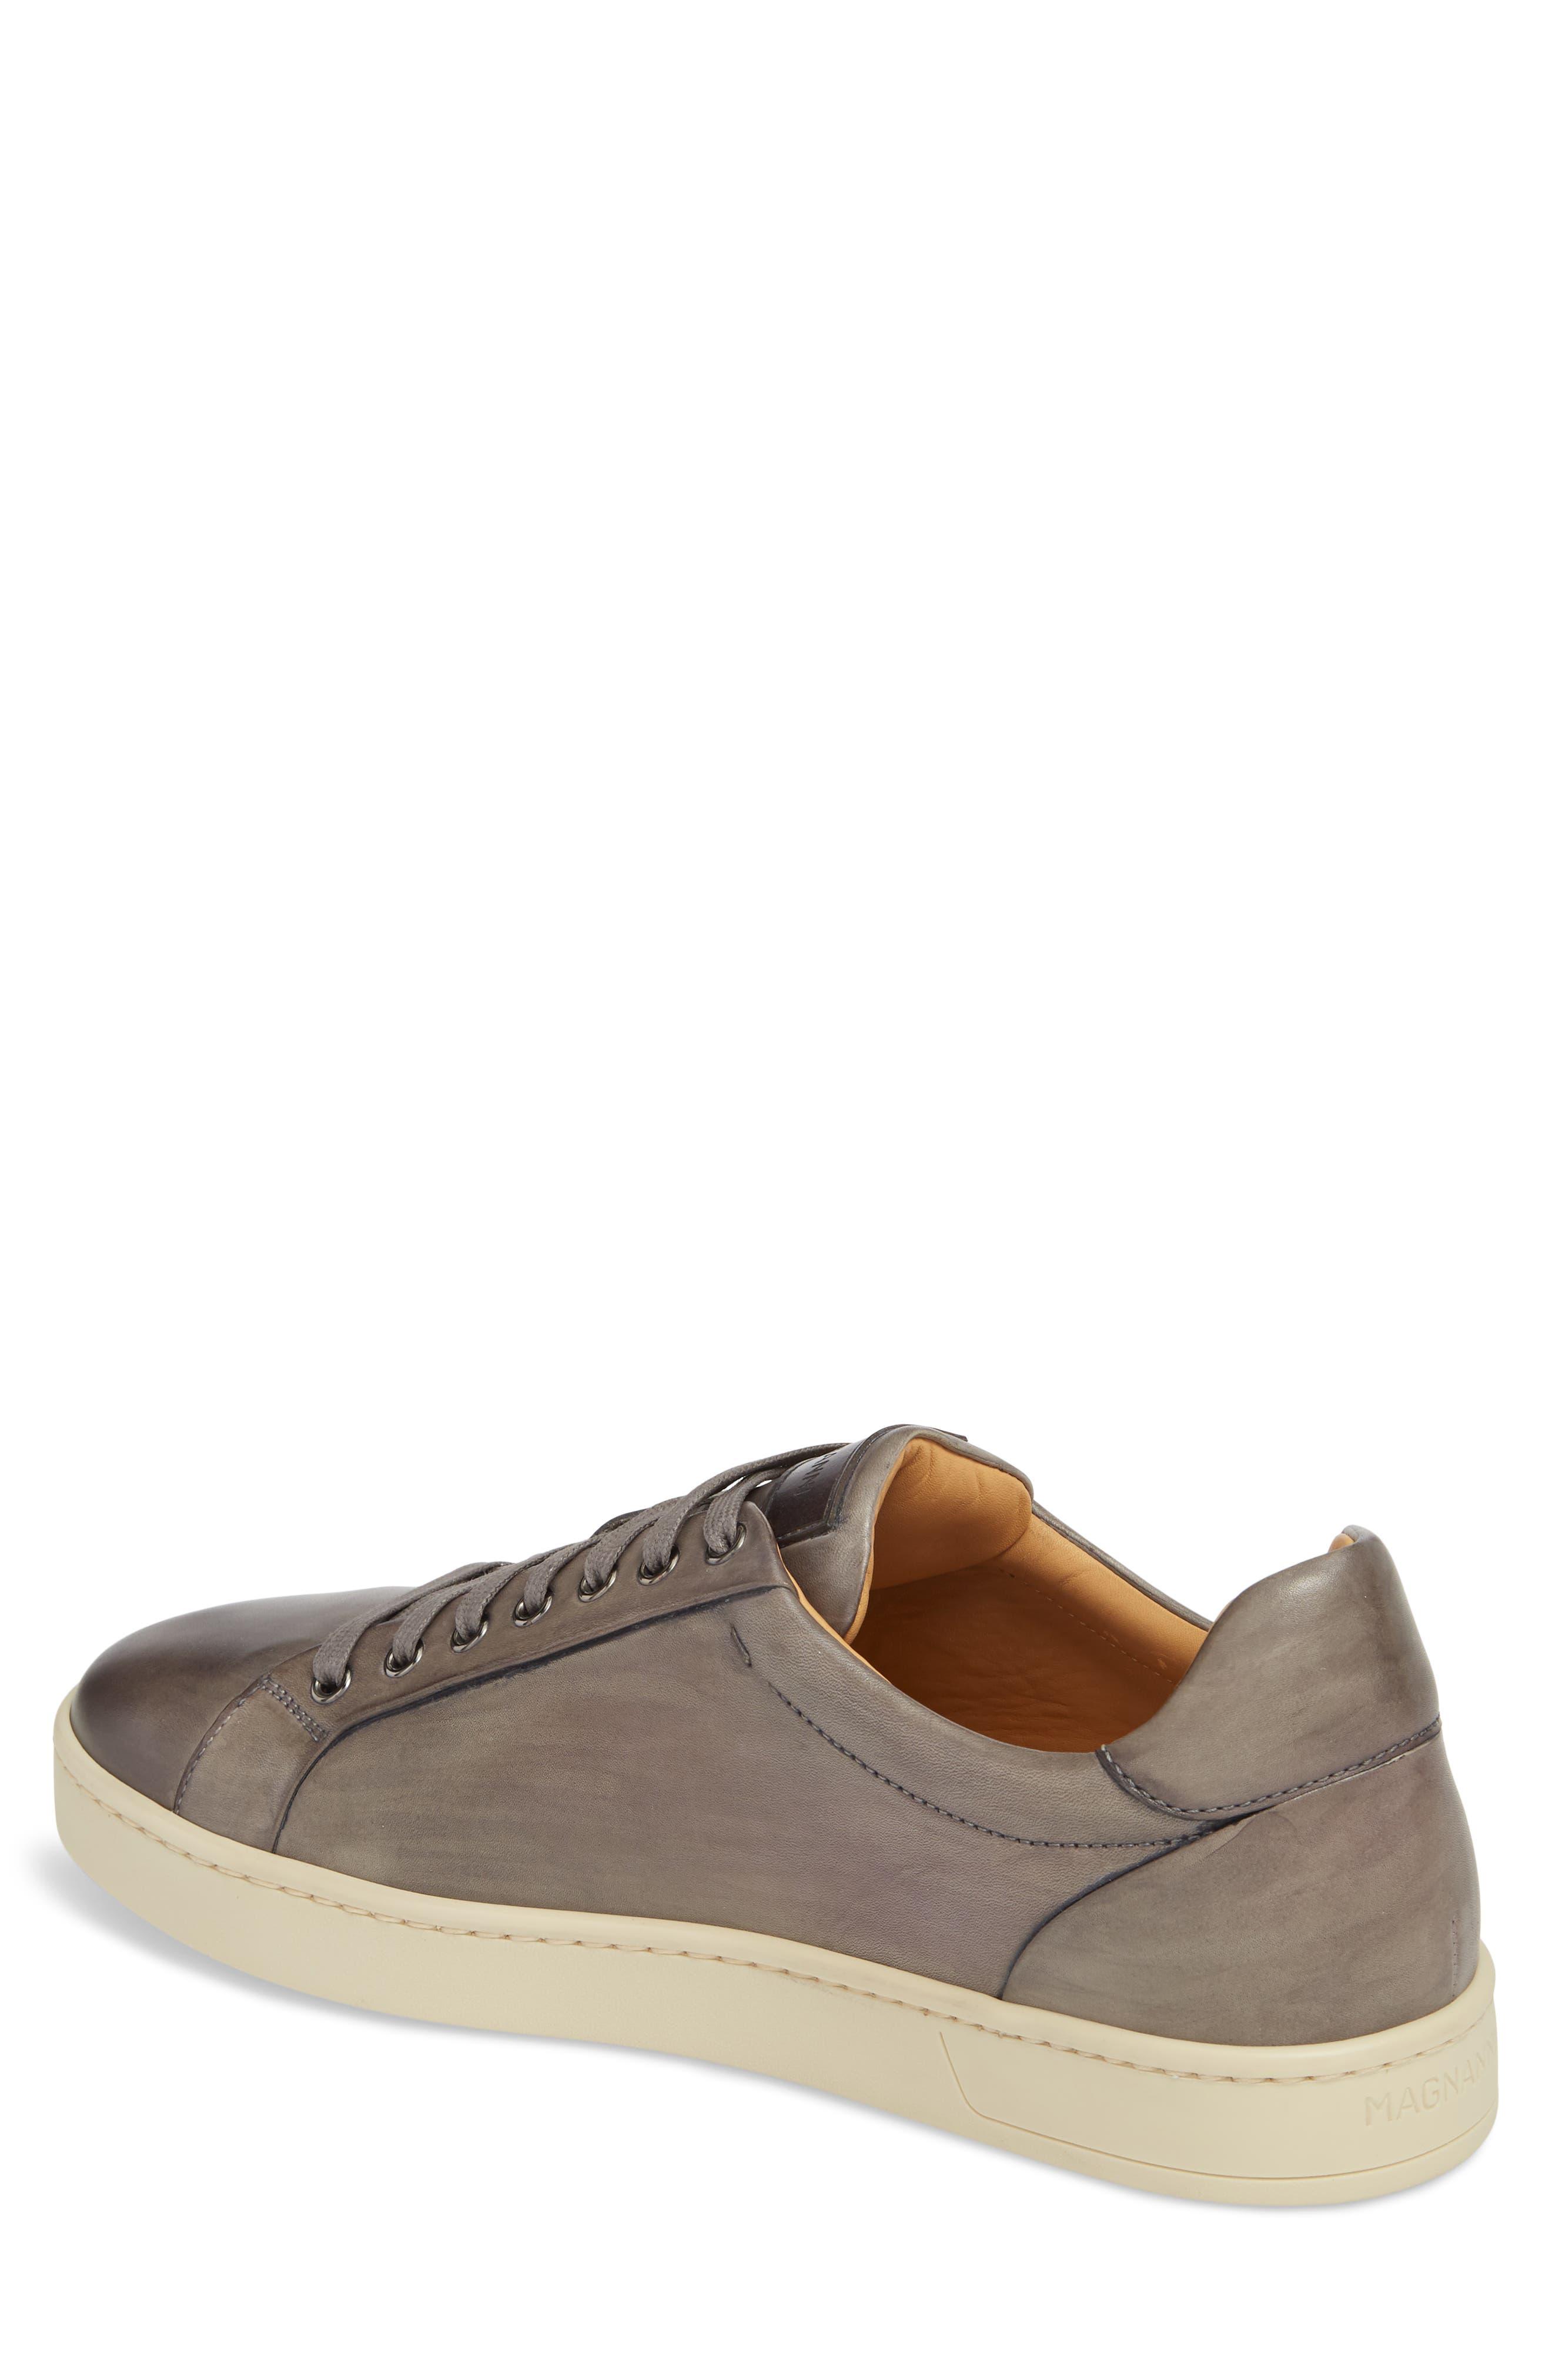 Alternate Image 2  - Magnanni Elonso Low Top Sneaker (Men)